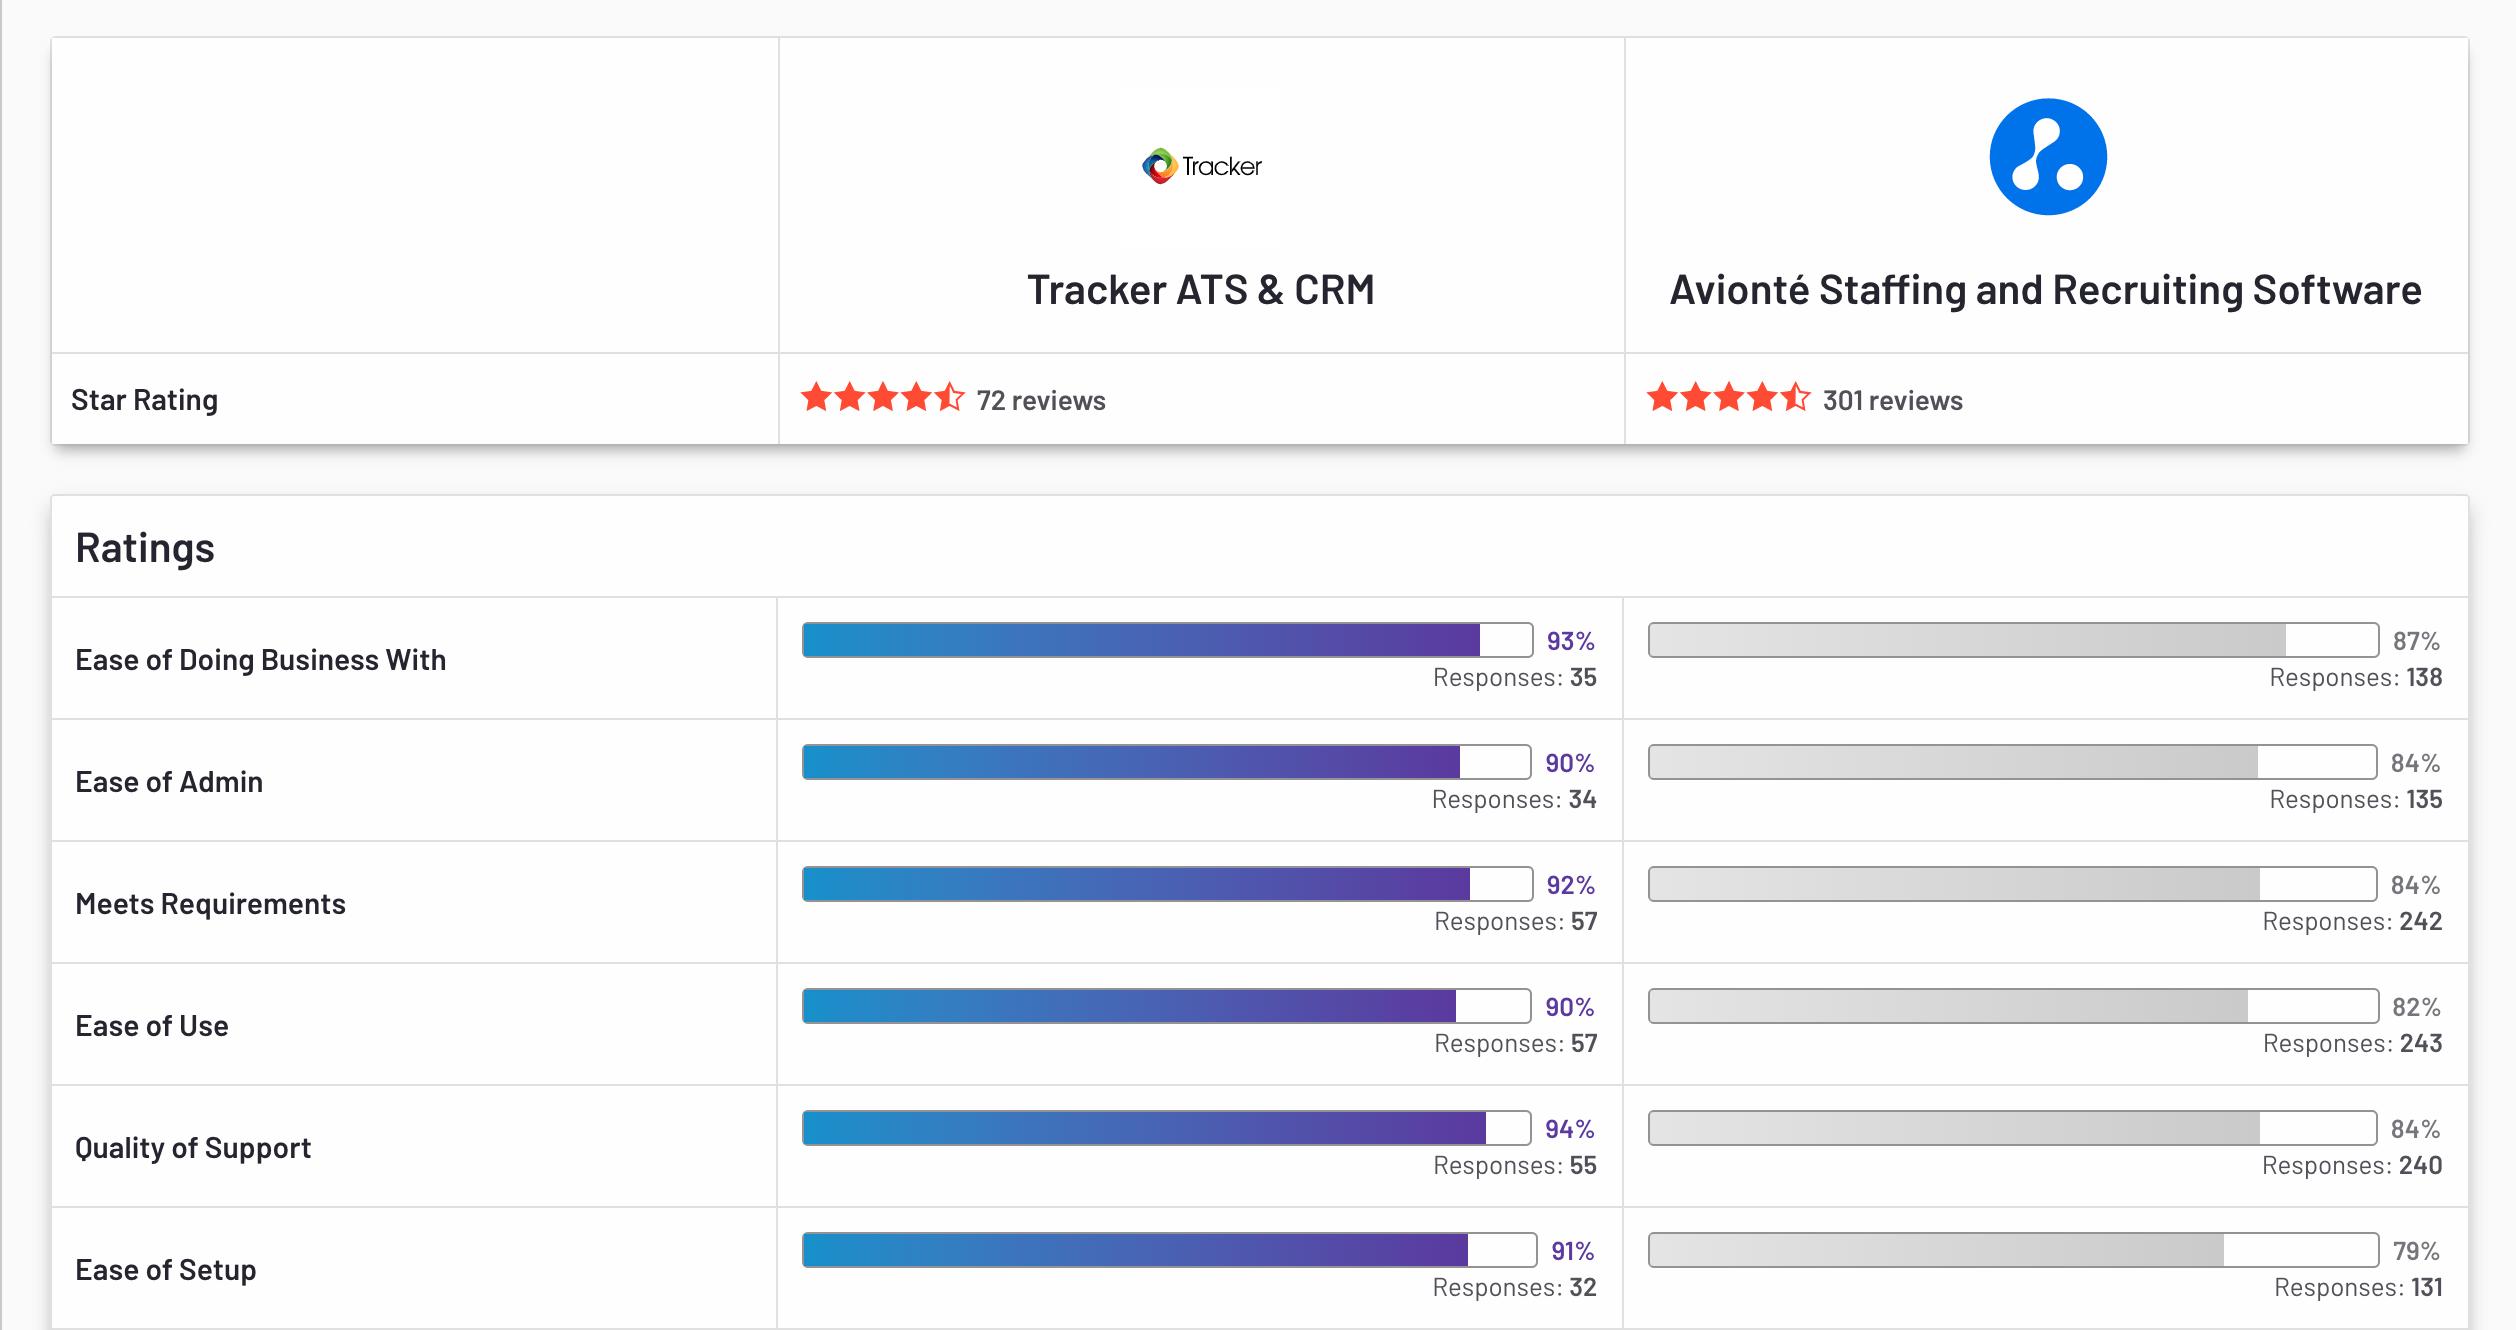 Tracker VS Avionte